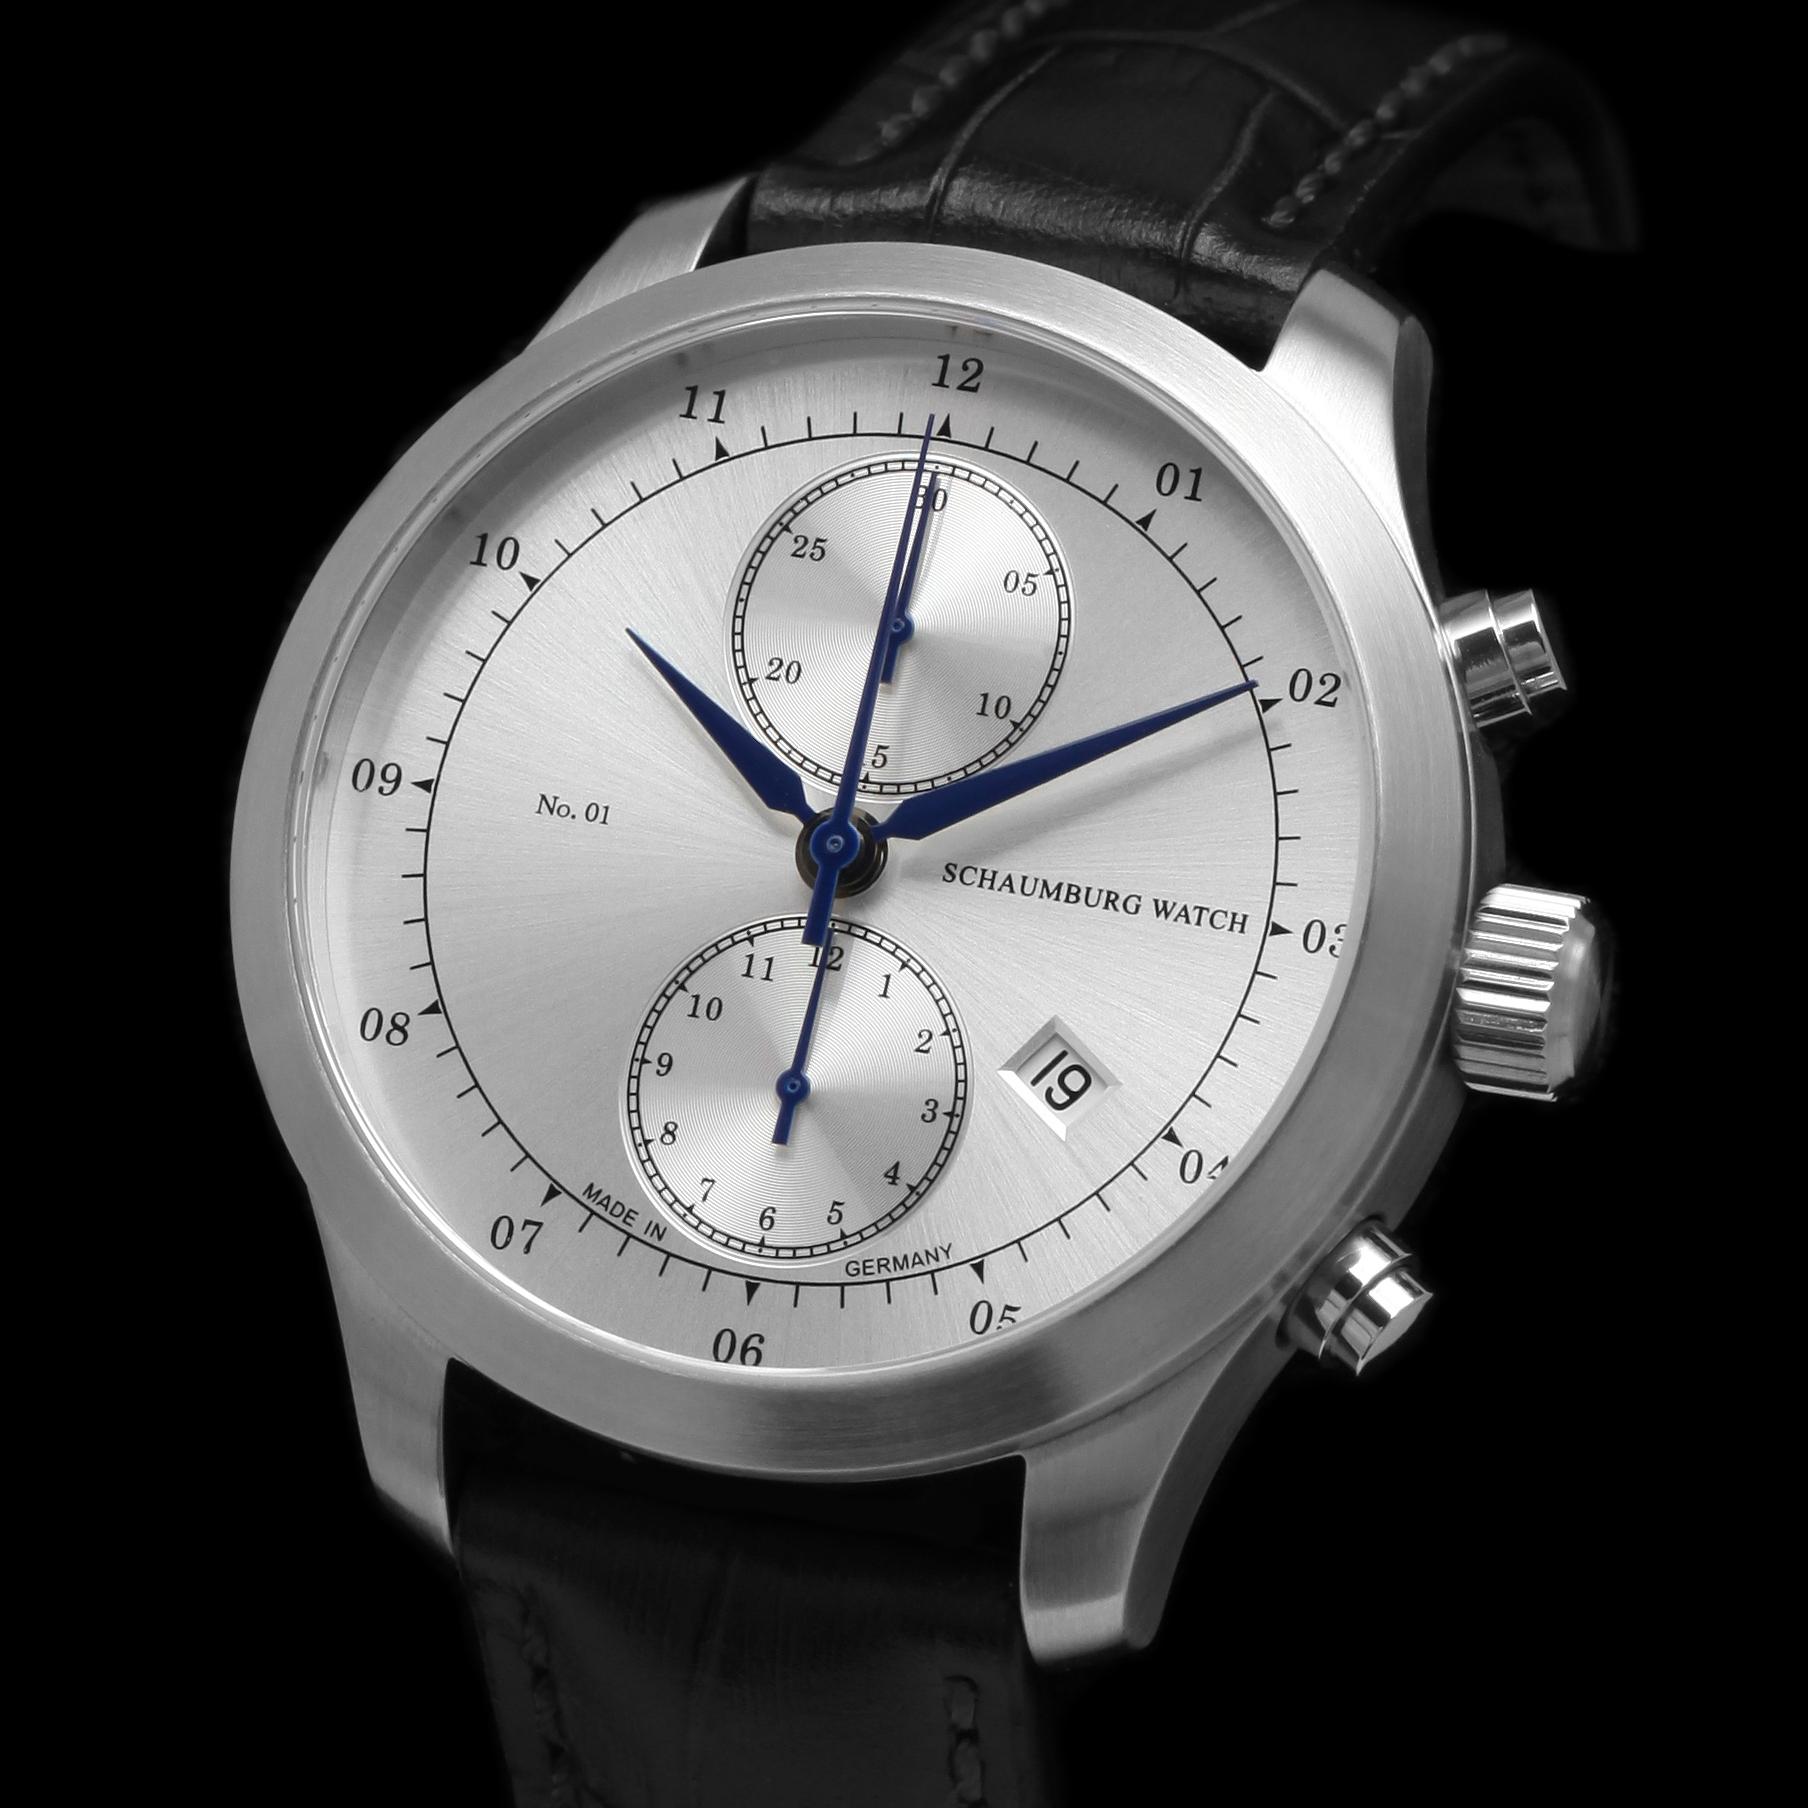 Schaumburg Watch Chronograph 01